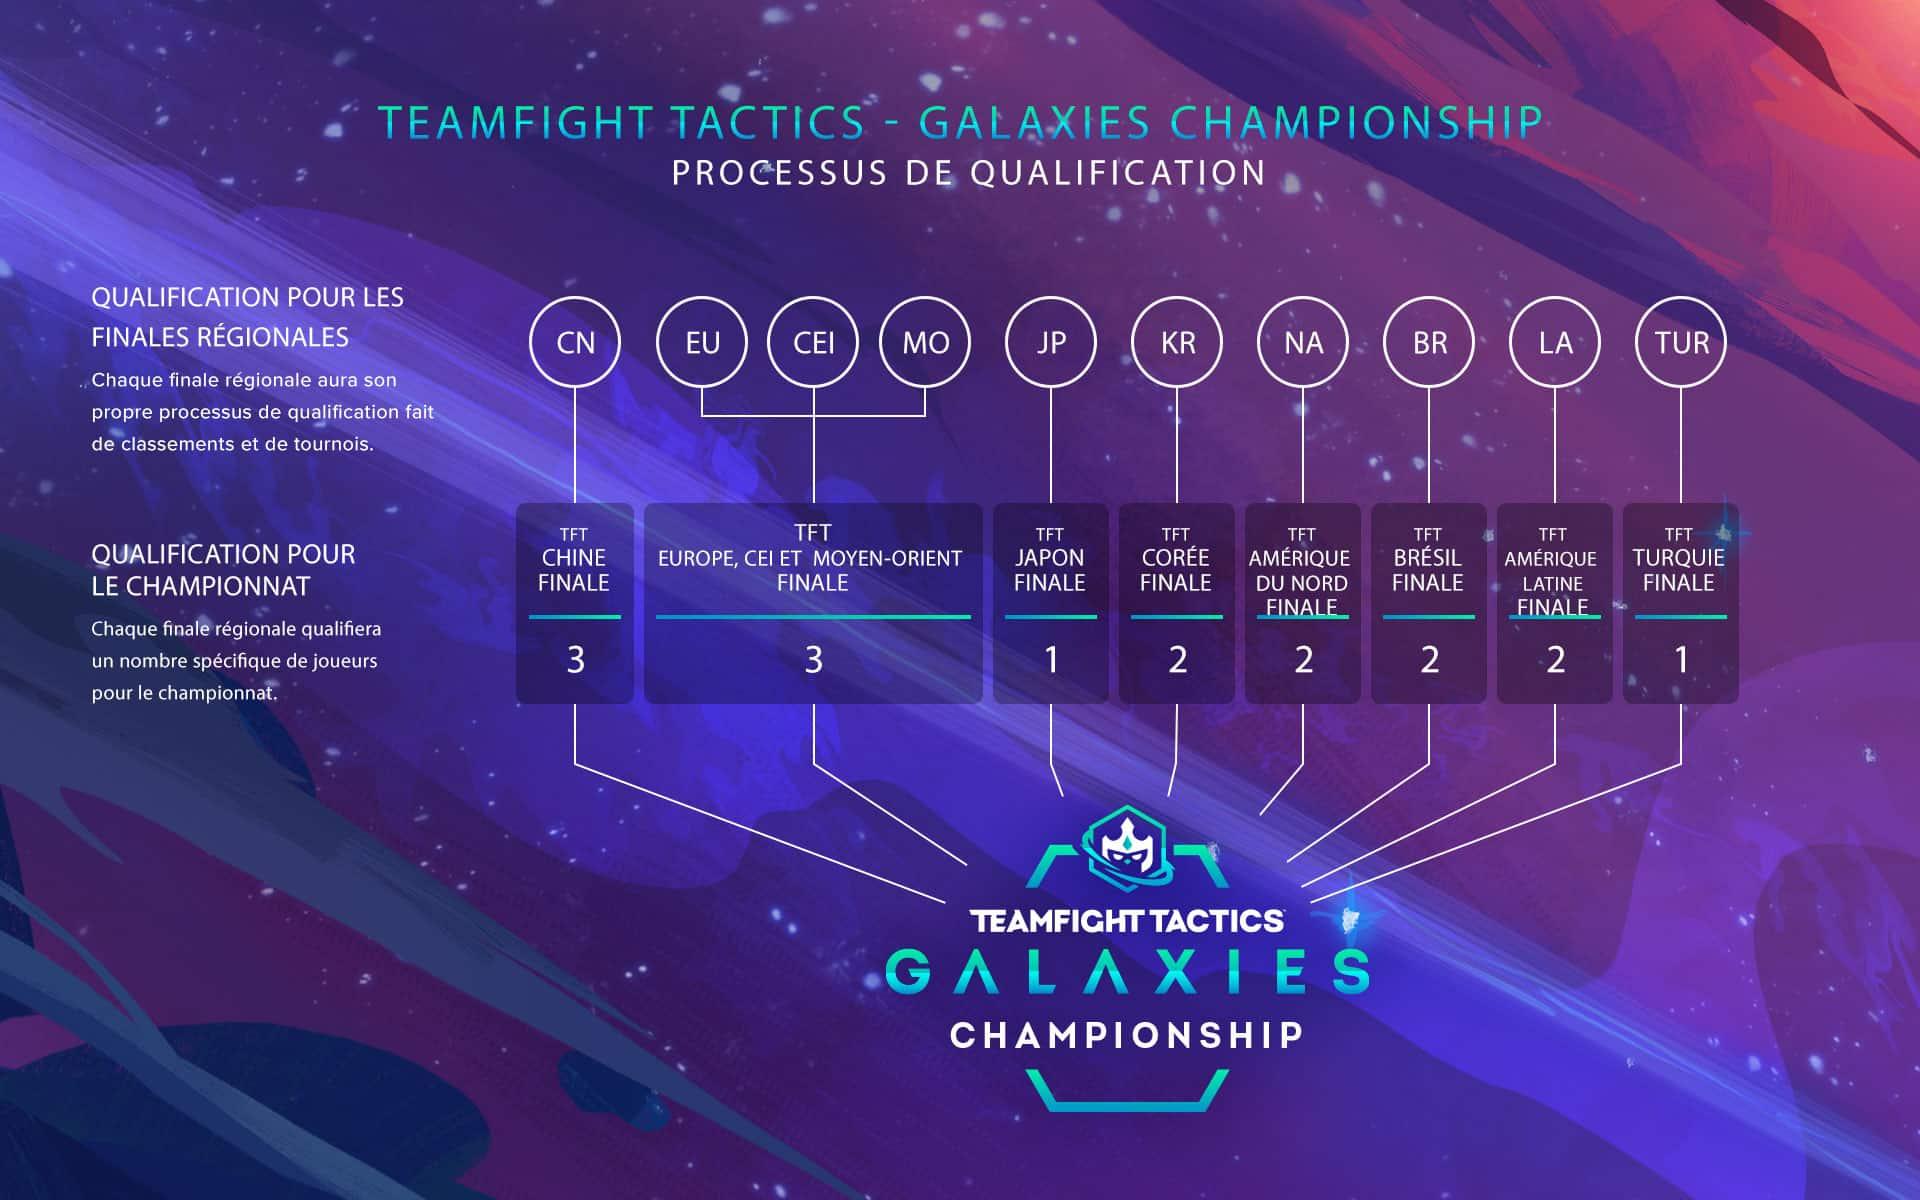 tft-galaxies-teamfight-tactics-championnat-international-qualifications